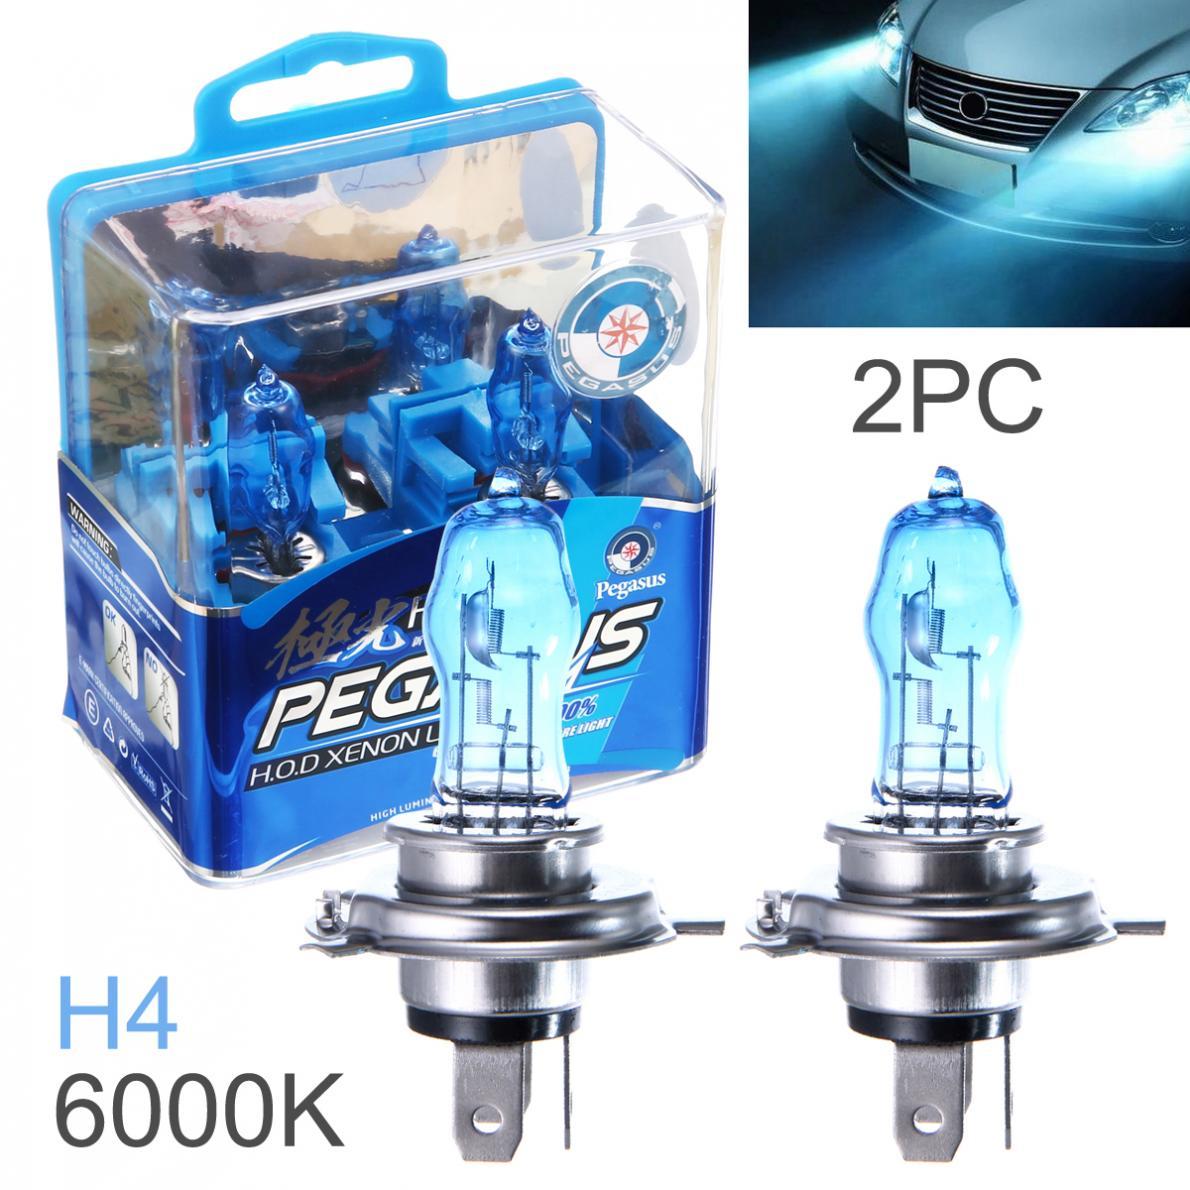 2Pcs 9006 Car Headlights 6000K 12V 100W Light Super White Halogen HOD Bulb